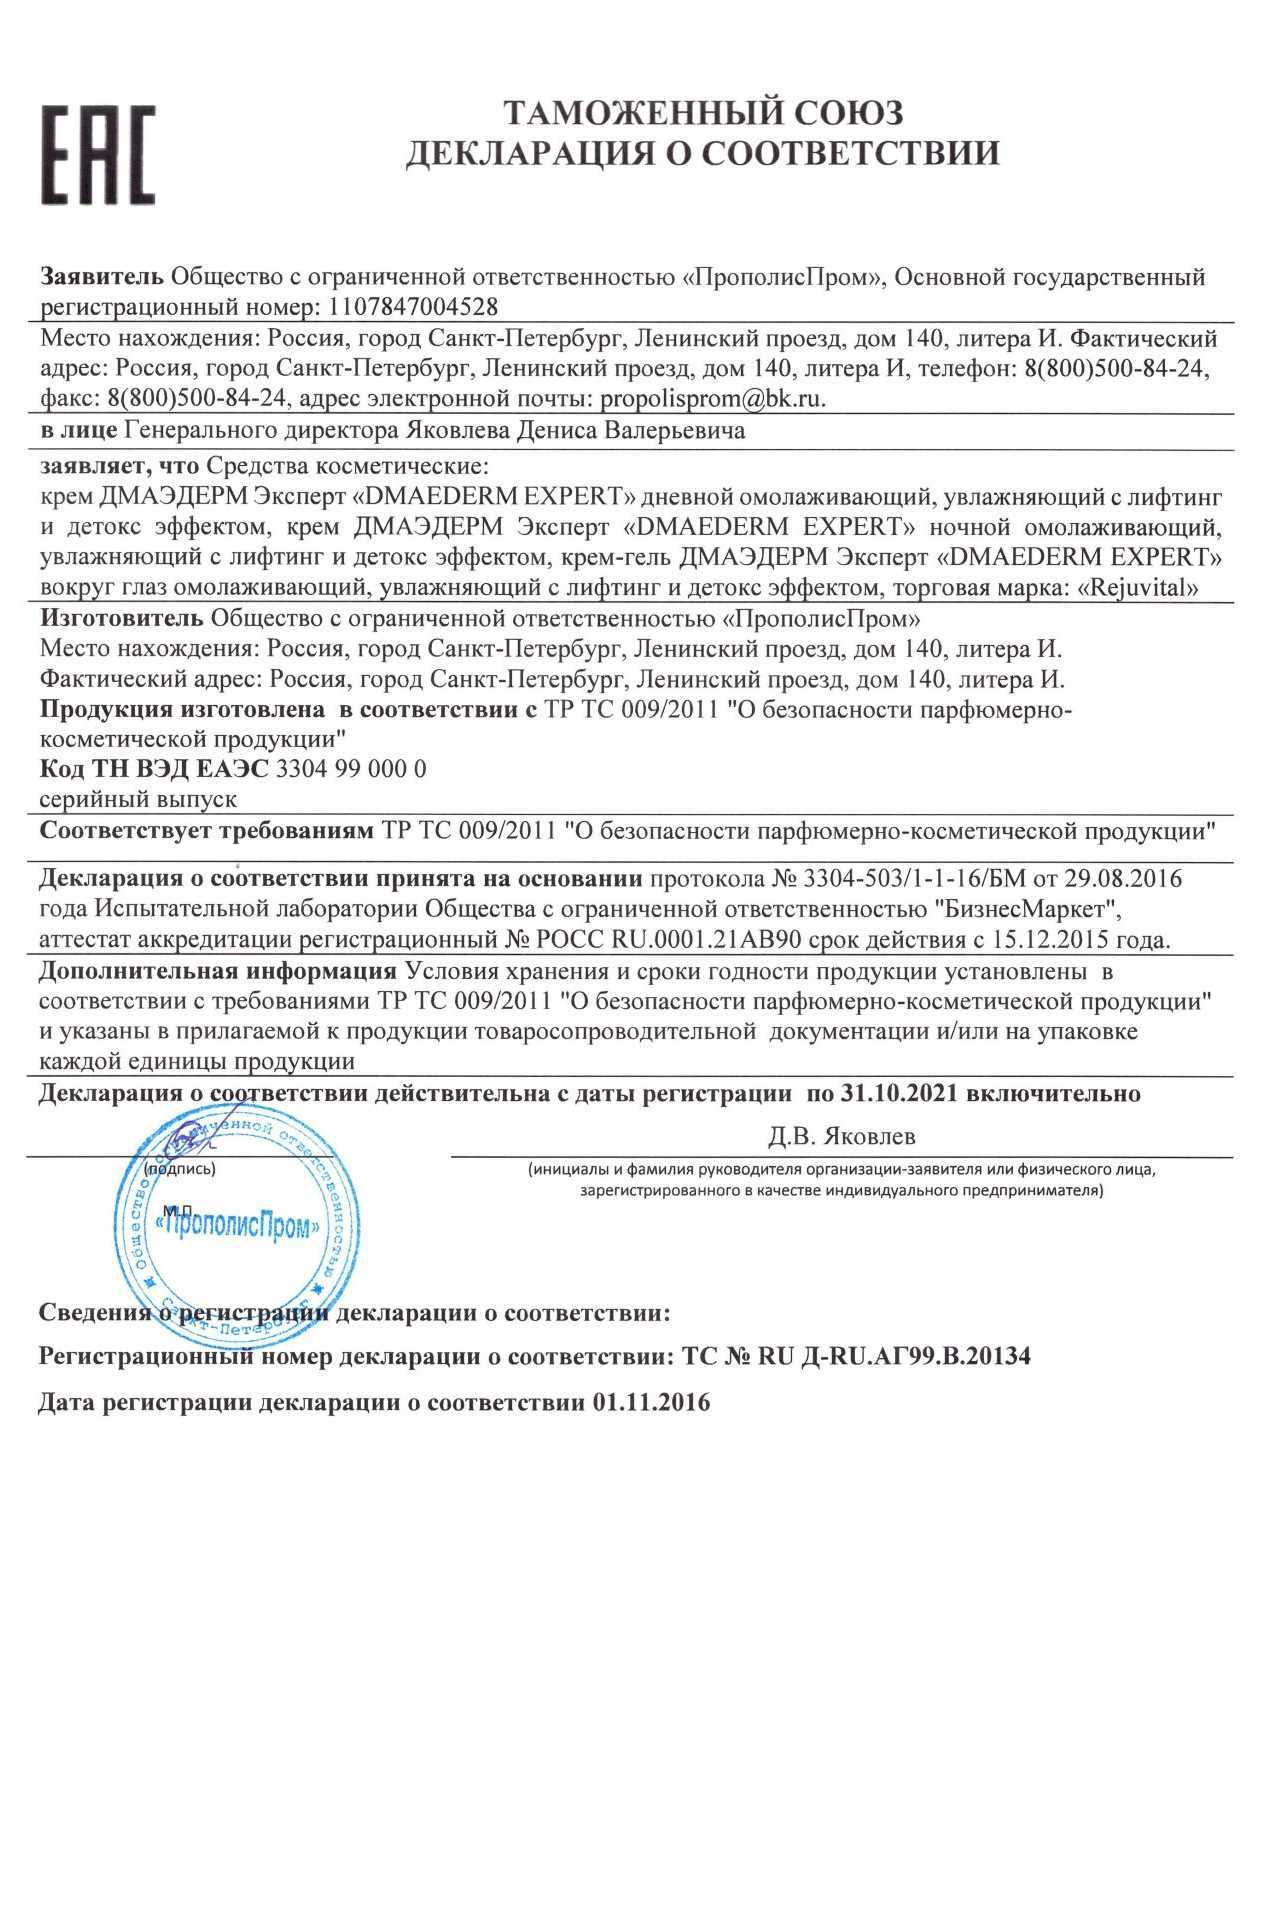 DMAEDERM EXPERT ANTI-AGE крем - Декларация соответствия